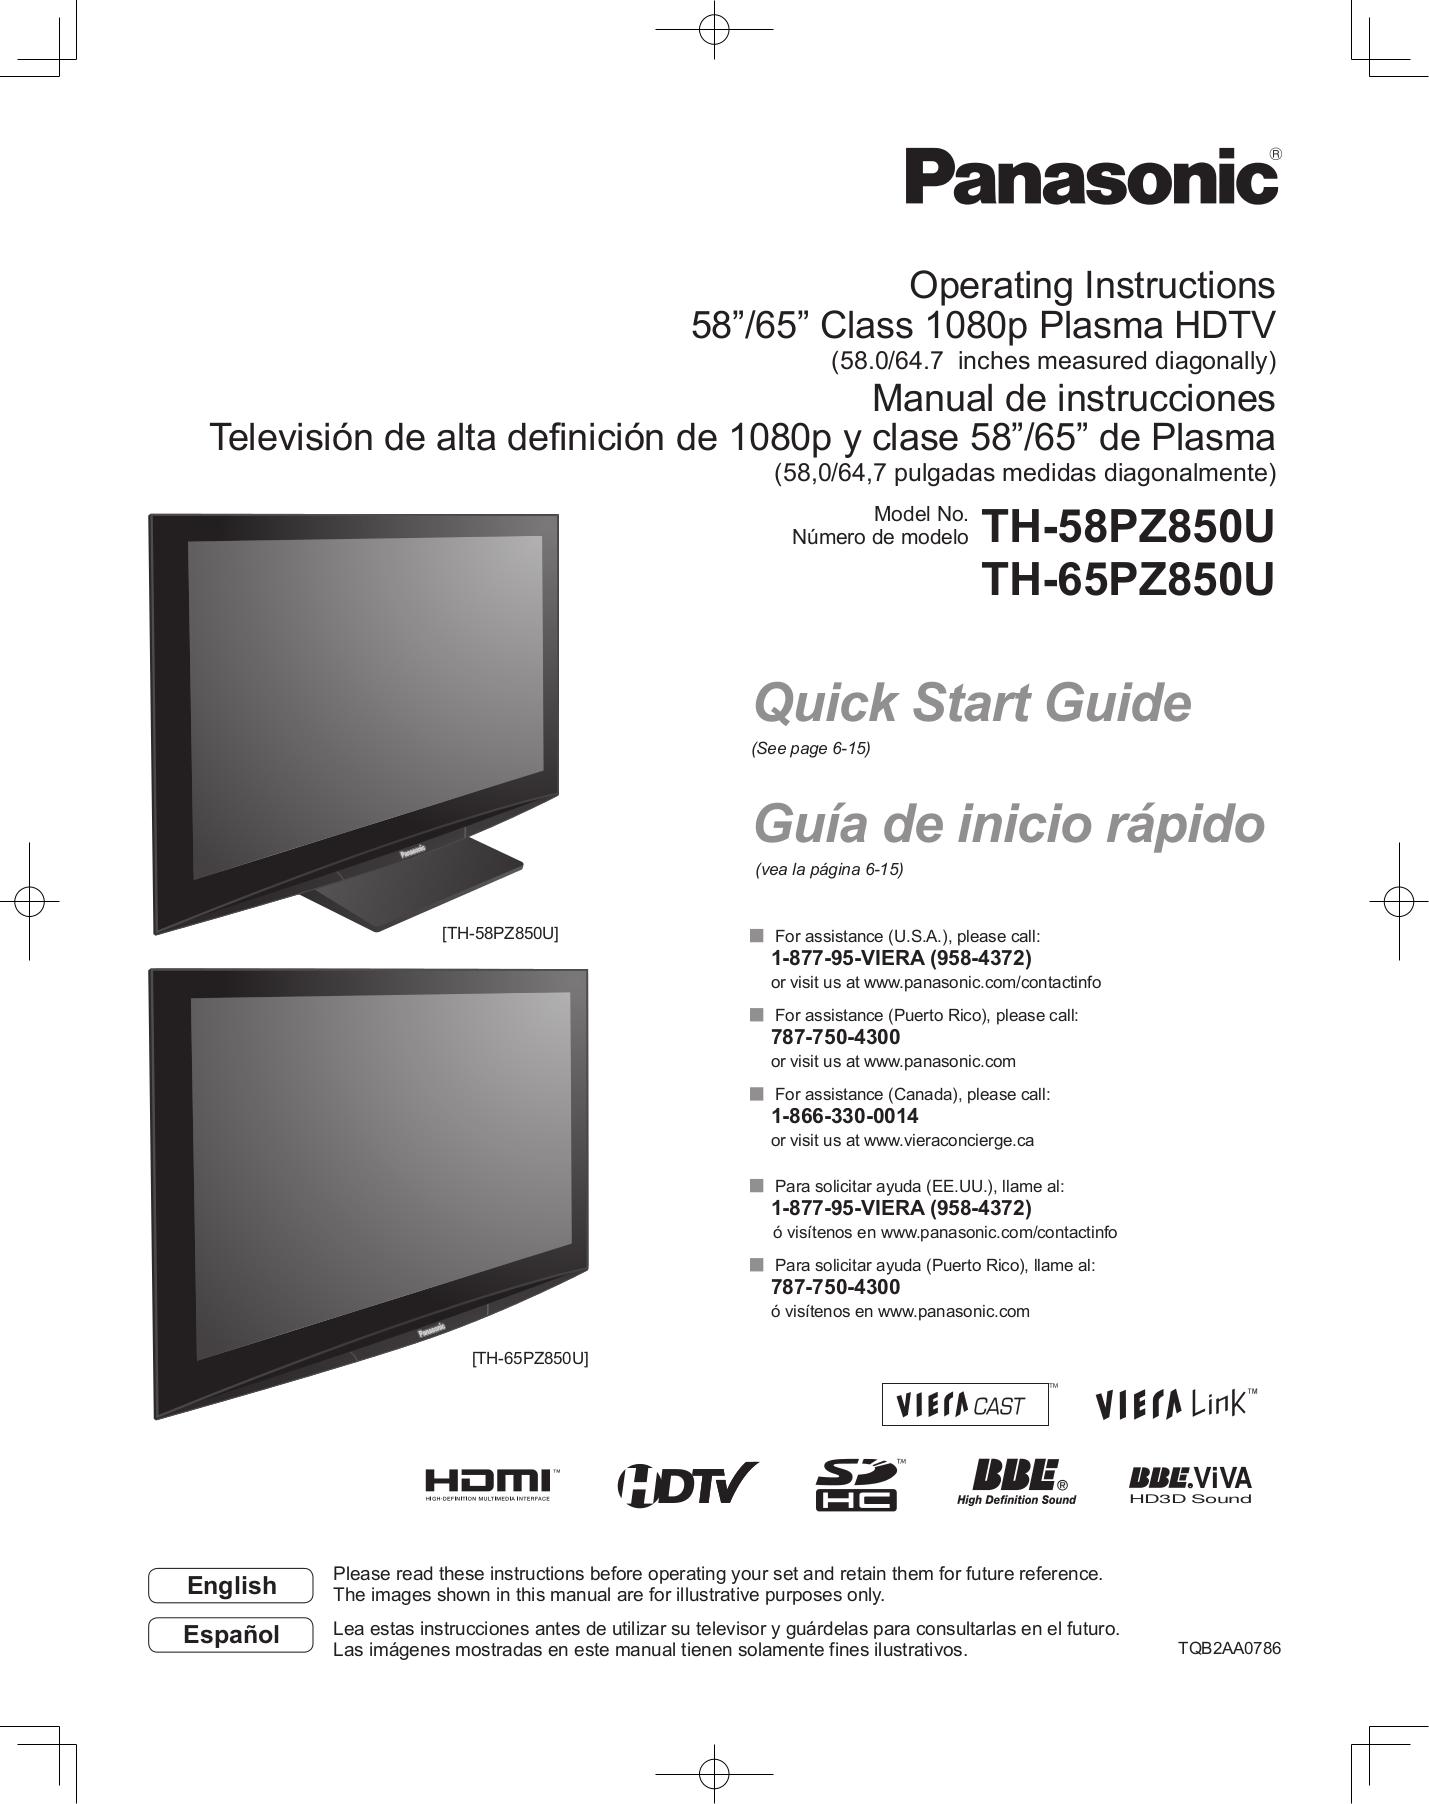 Download Free Pdf For Panasonic Viera Th 58pz850 Tv Manual border=